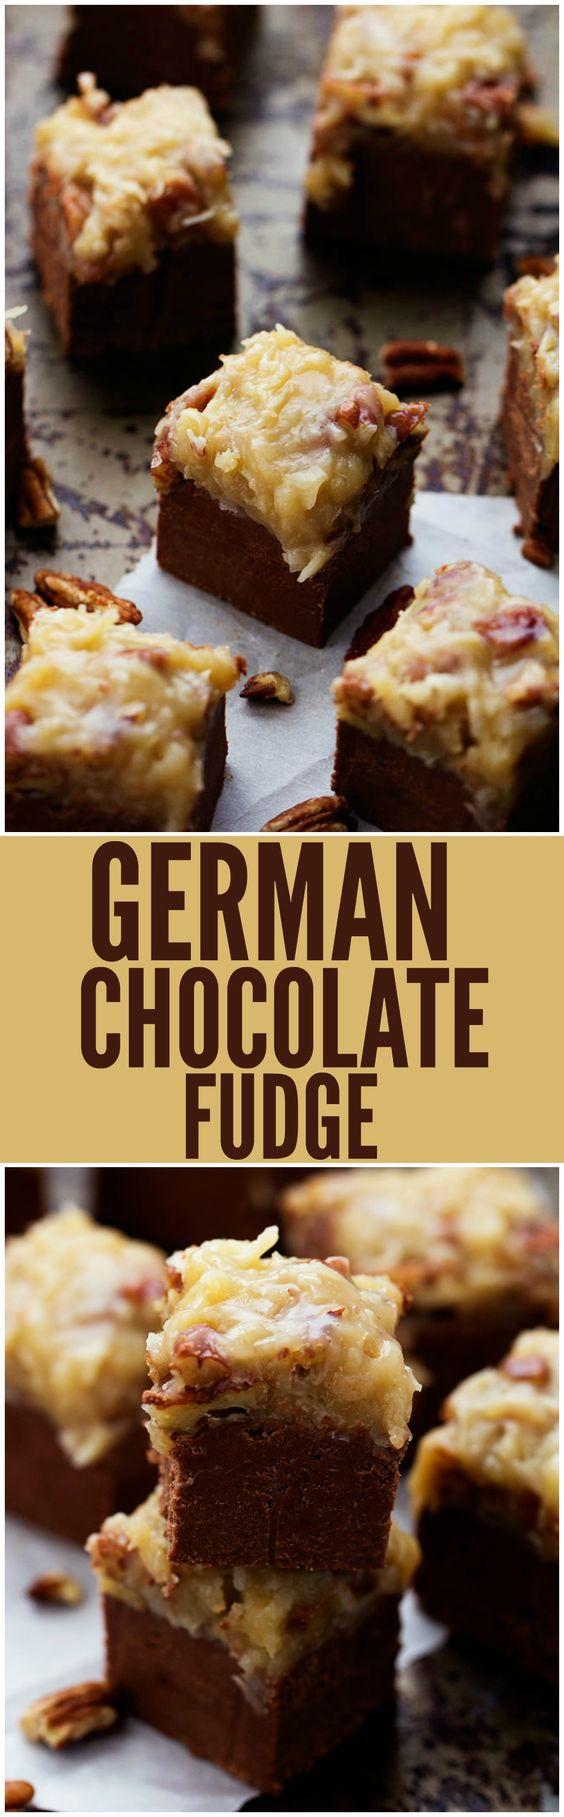 German Chocolate Fudge | Recipe | Easy chocolate fudge, The o'jays ...